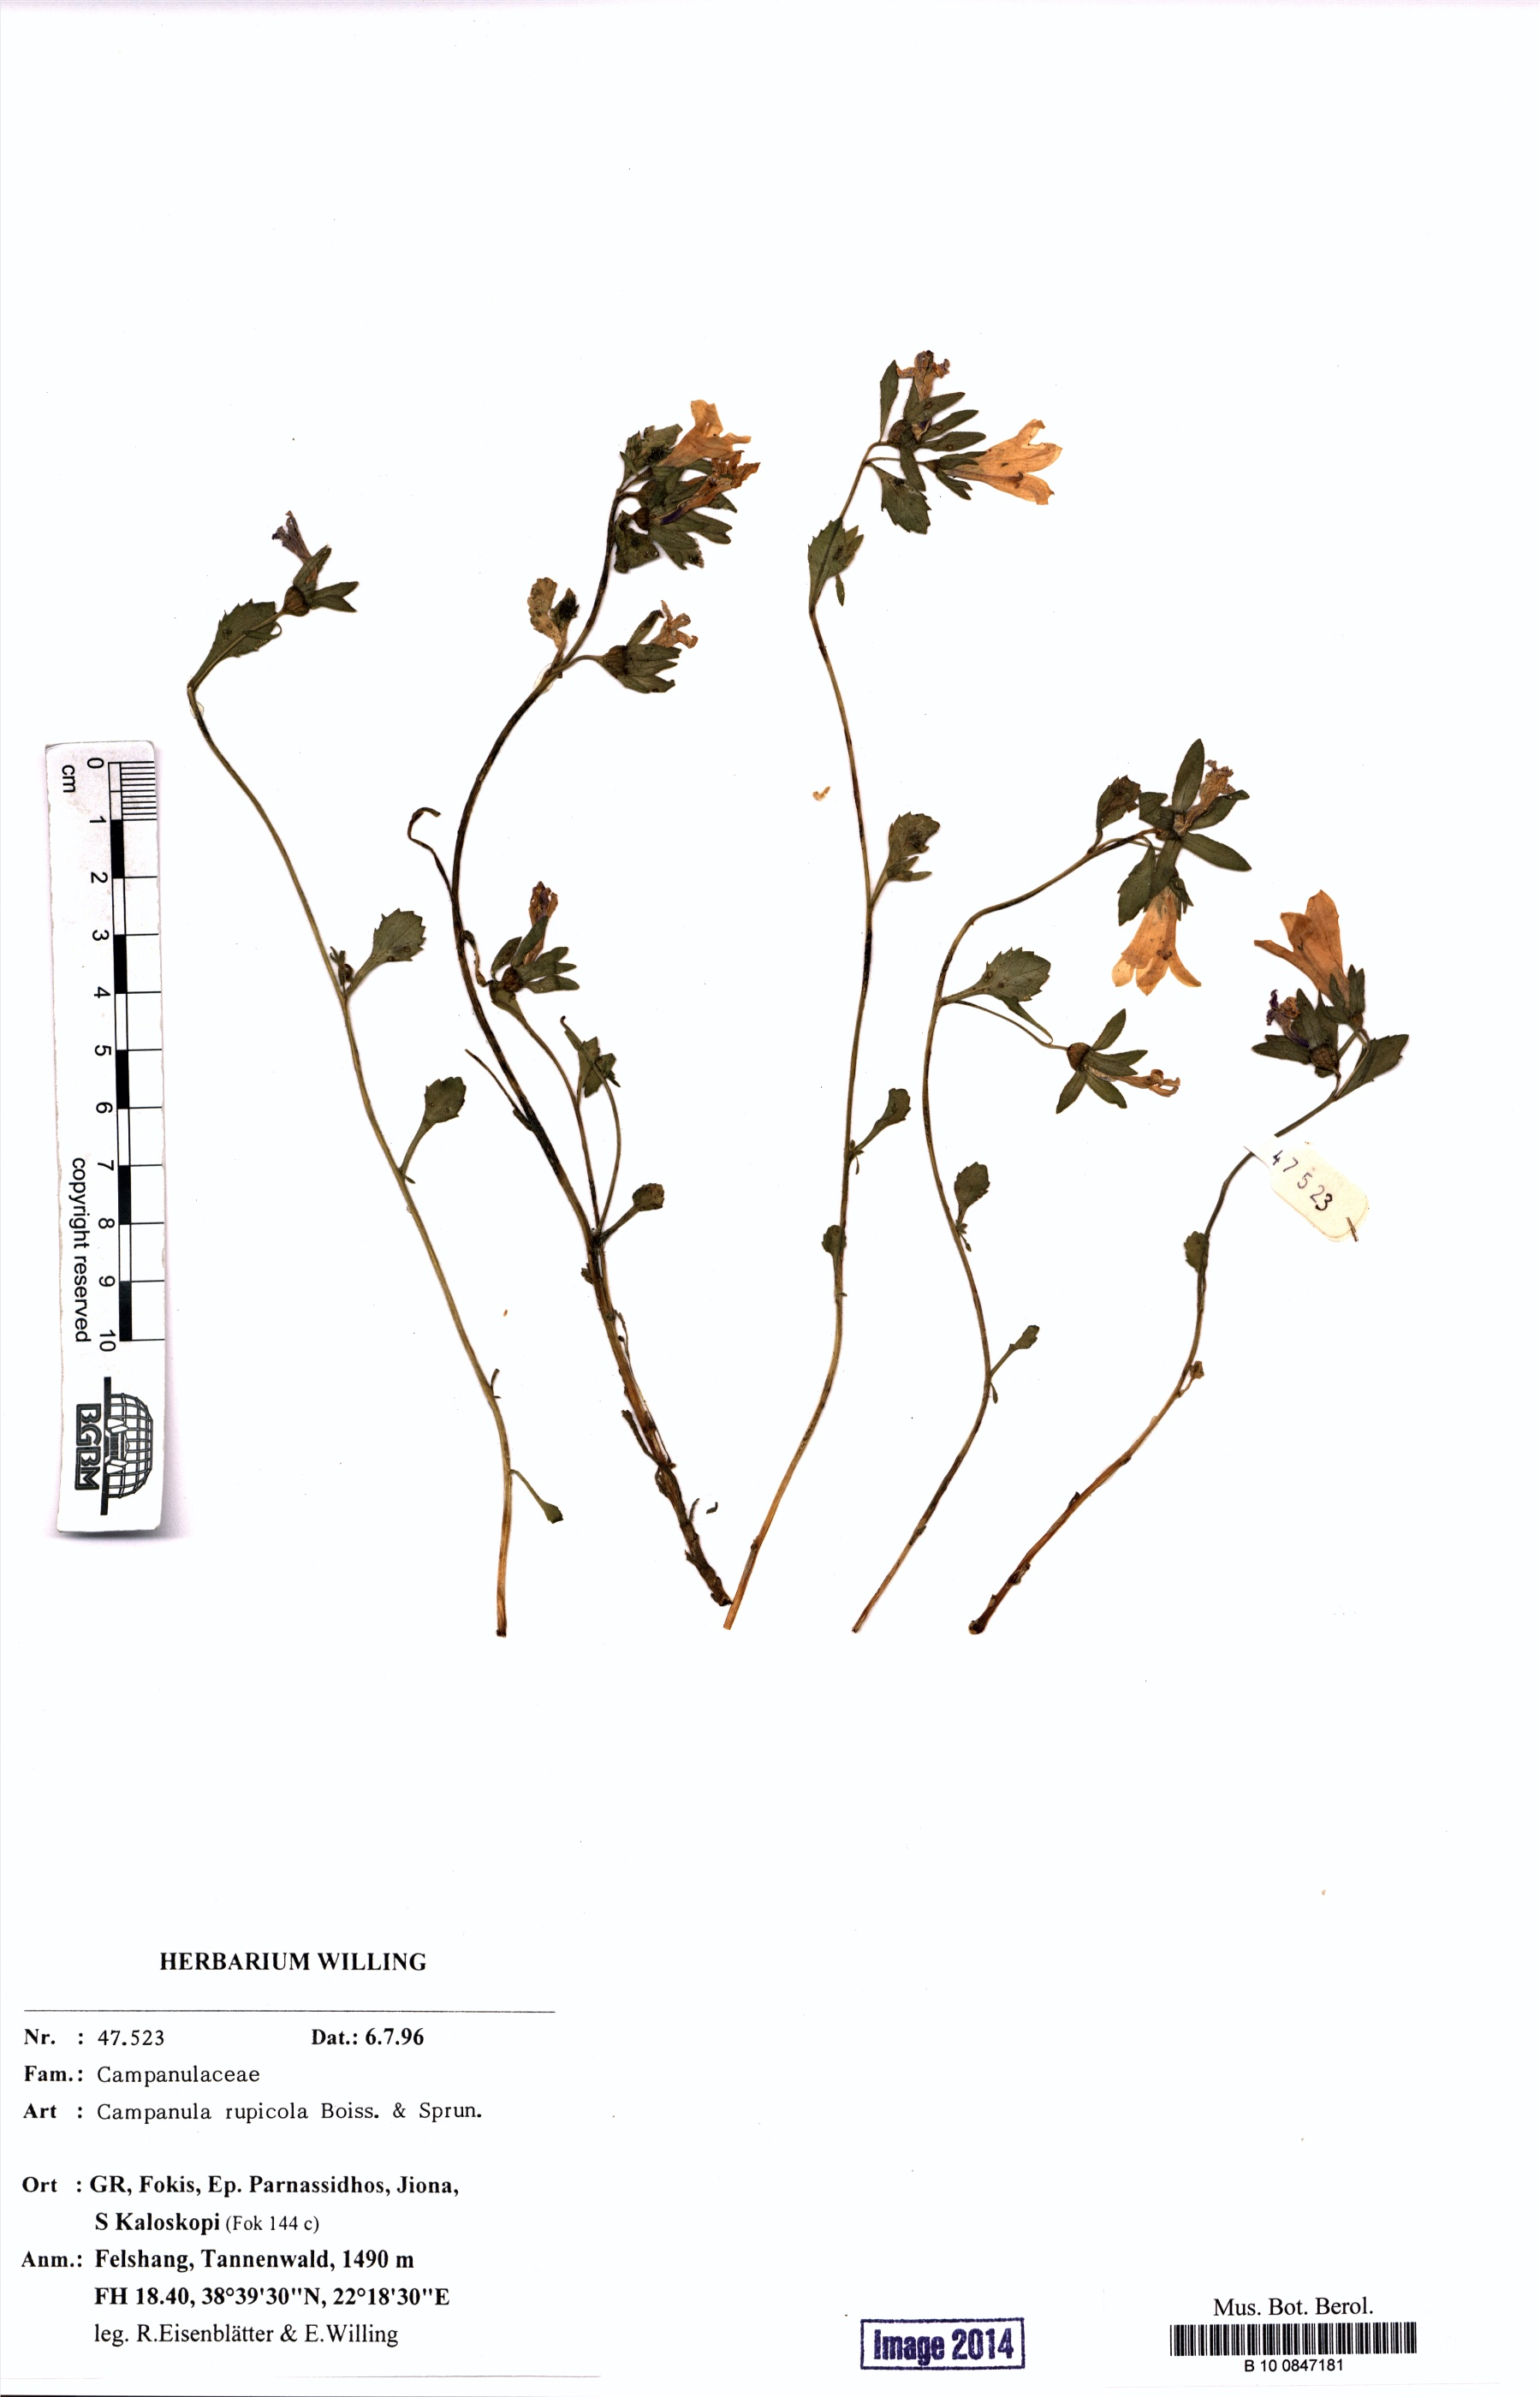 http://ww2.bgbm.org/herbarium/images/B/10/08/47/18/B_10_0847181.jpg